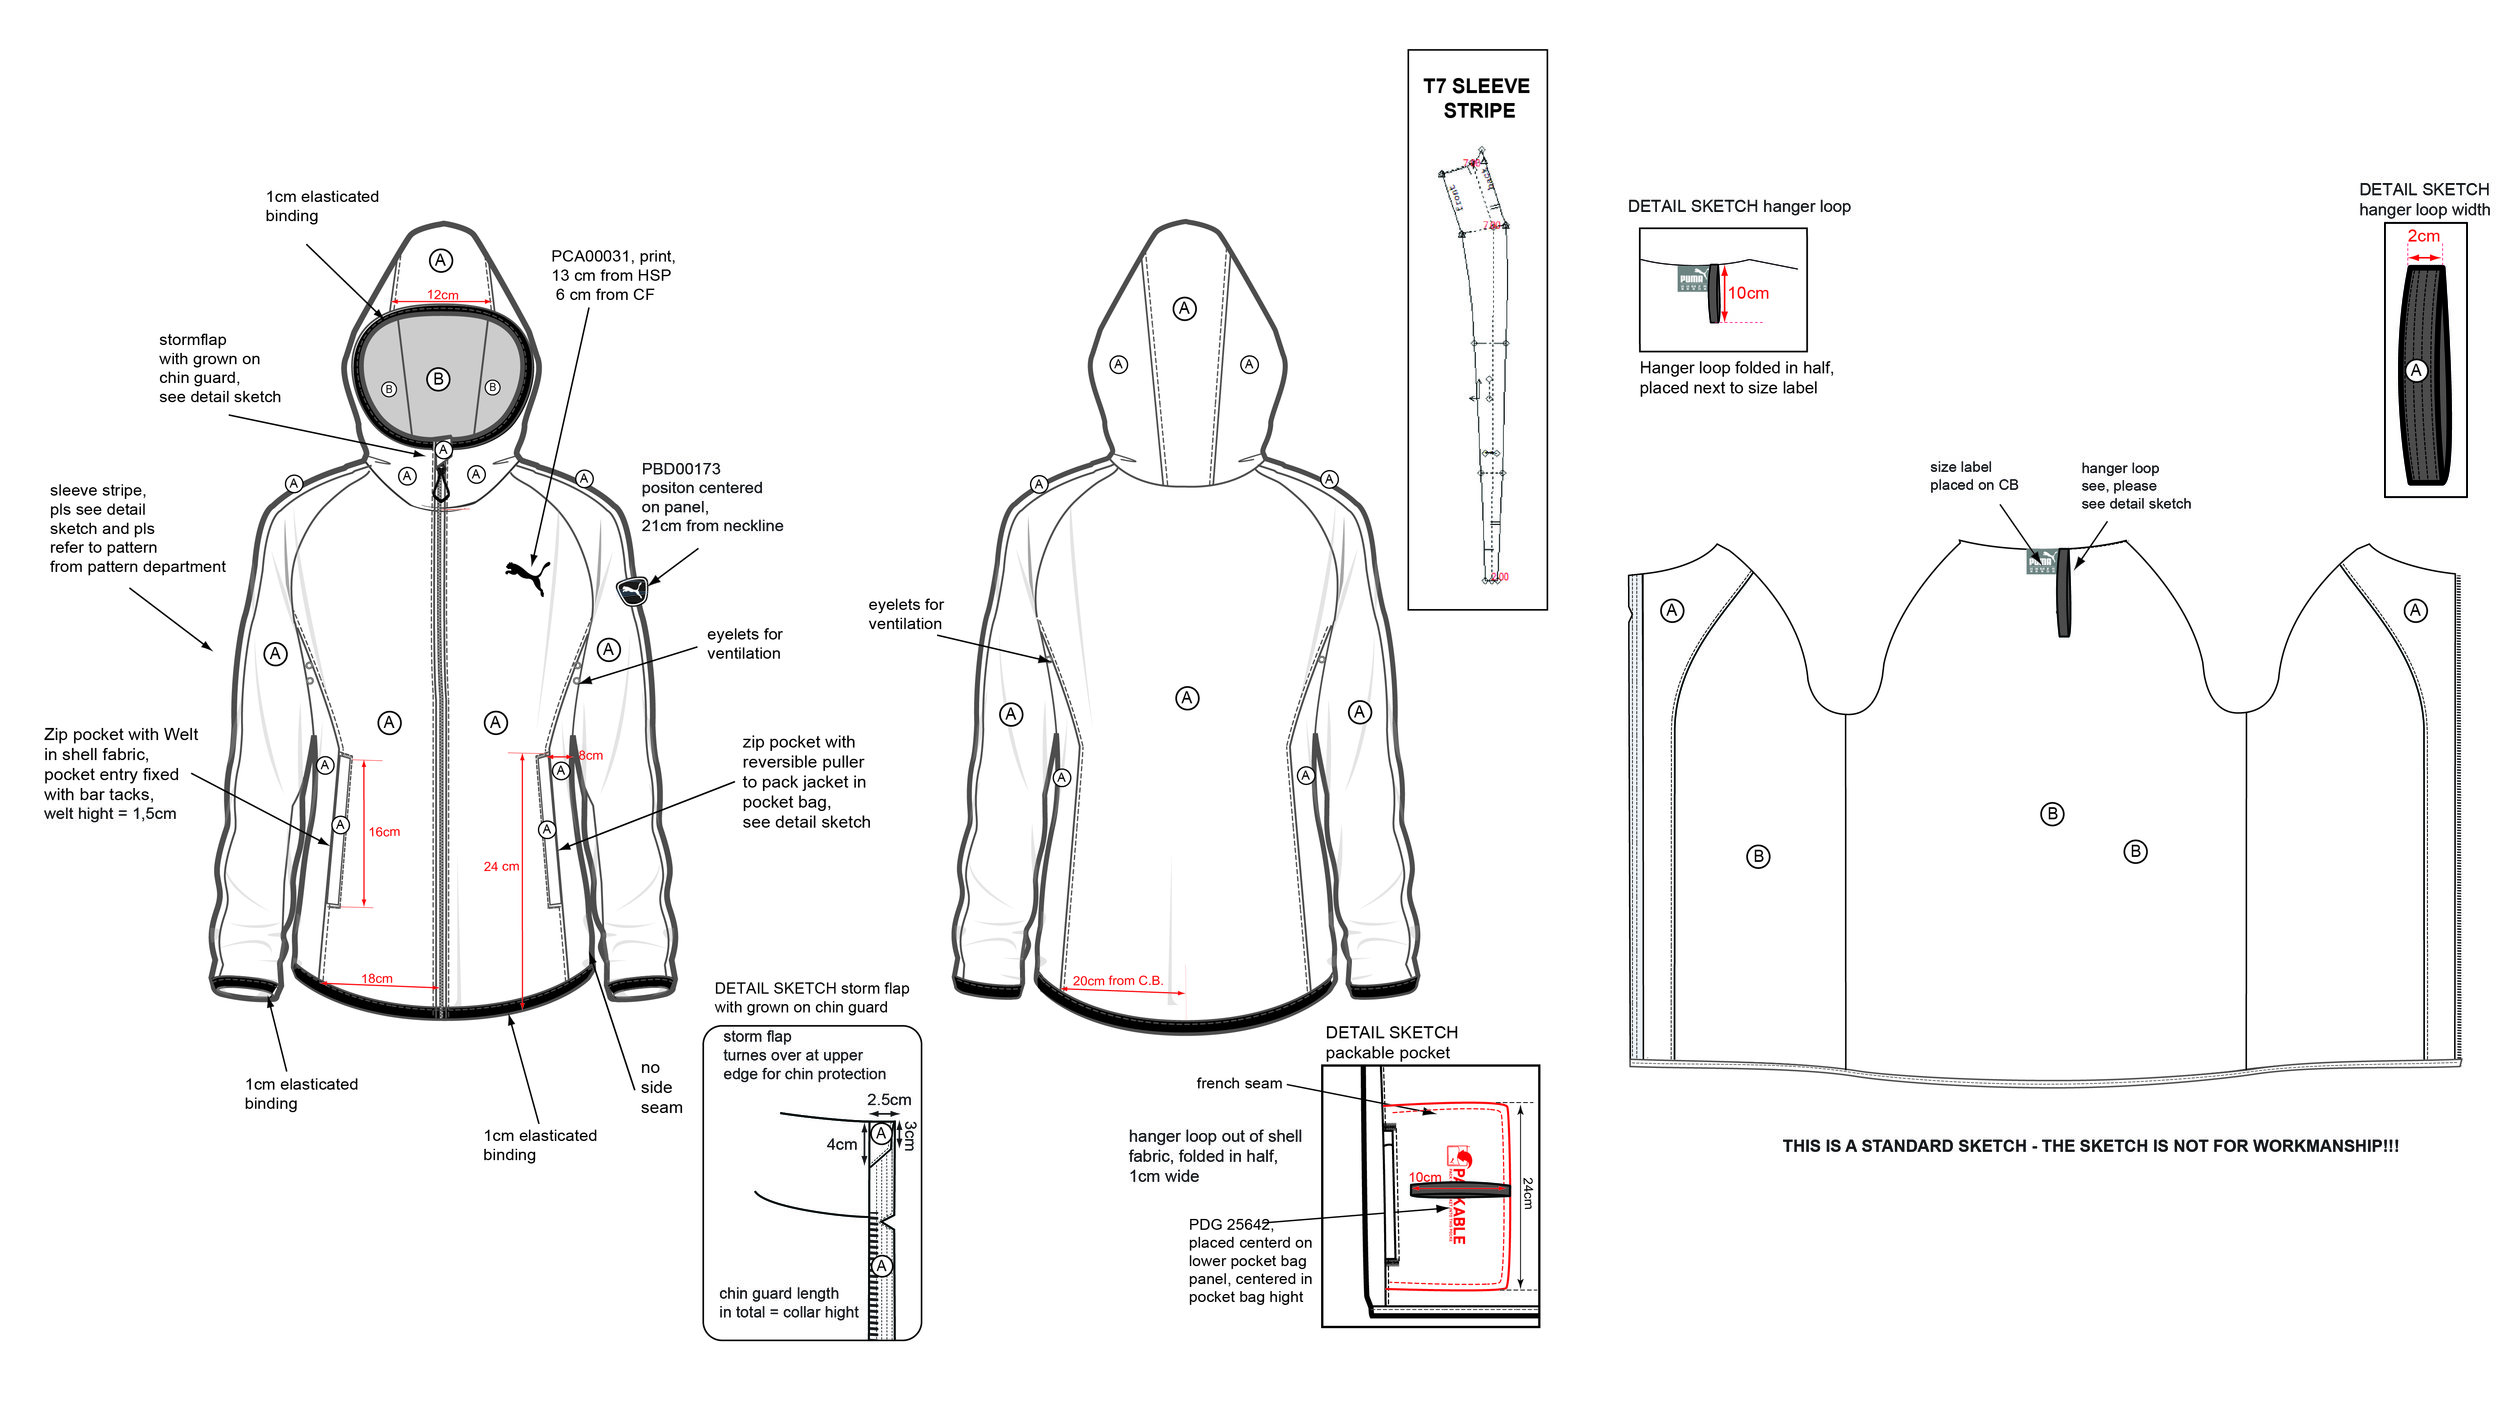 3. Technical Design -